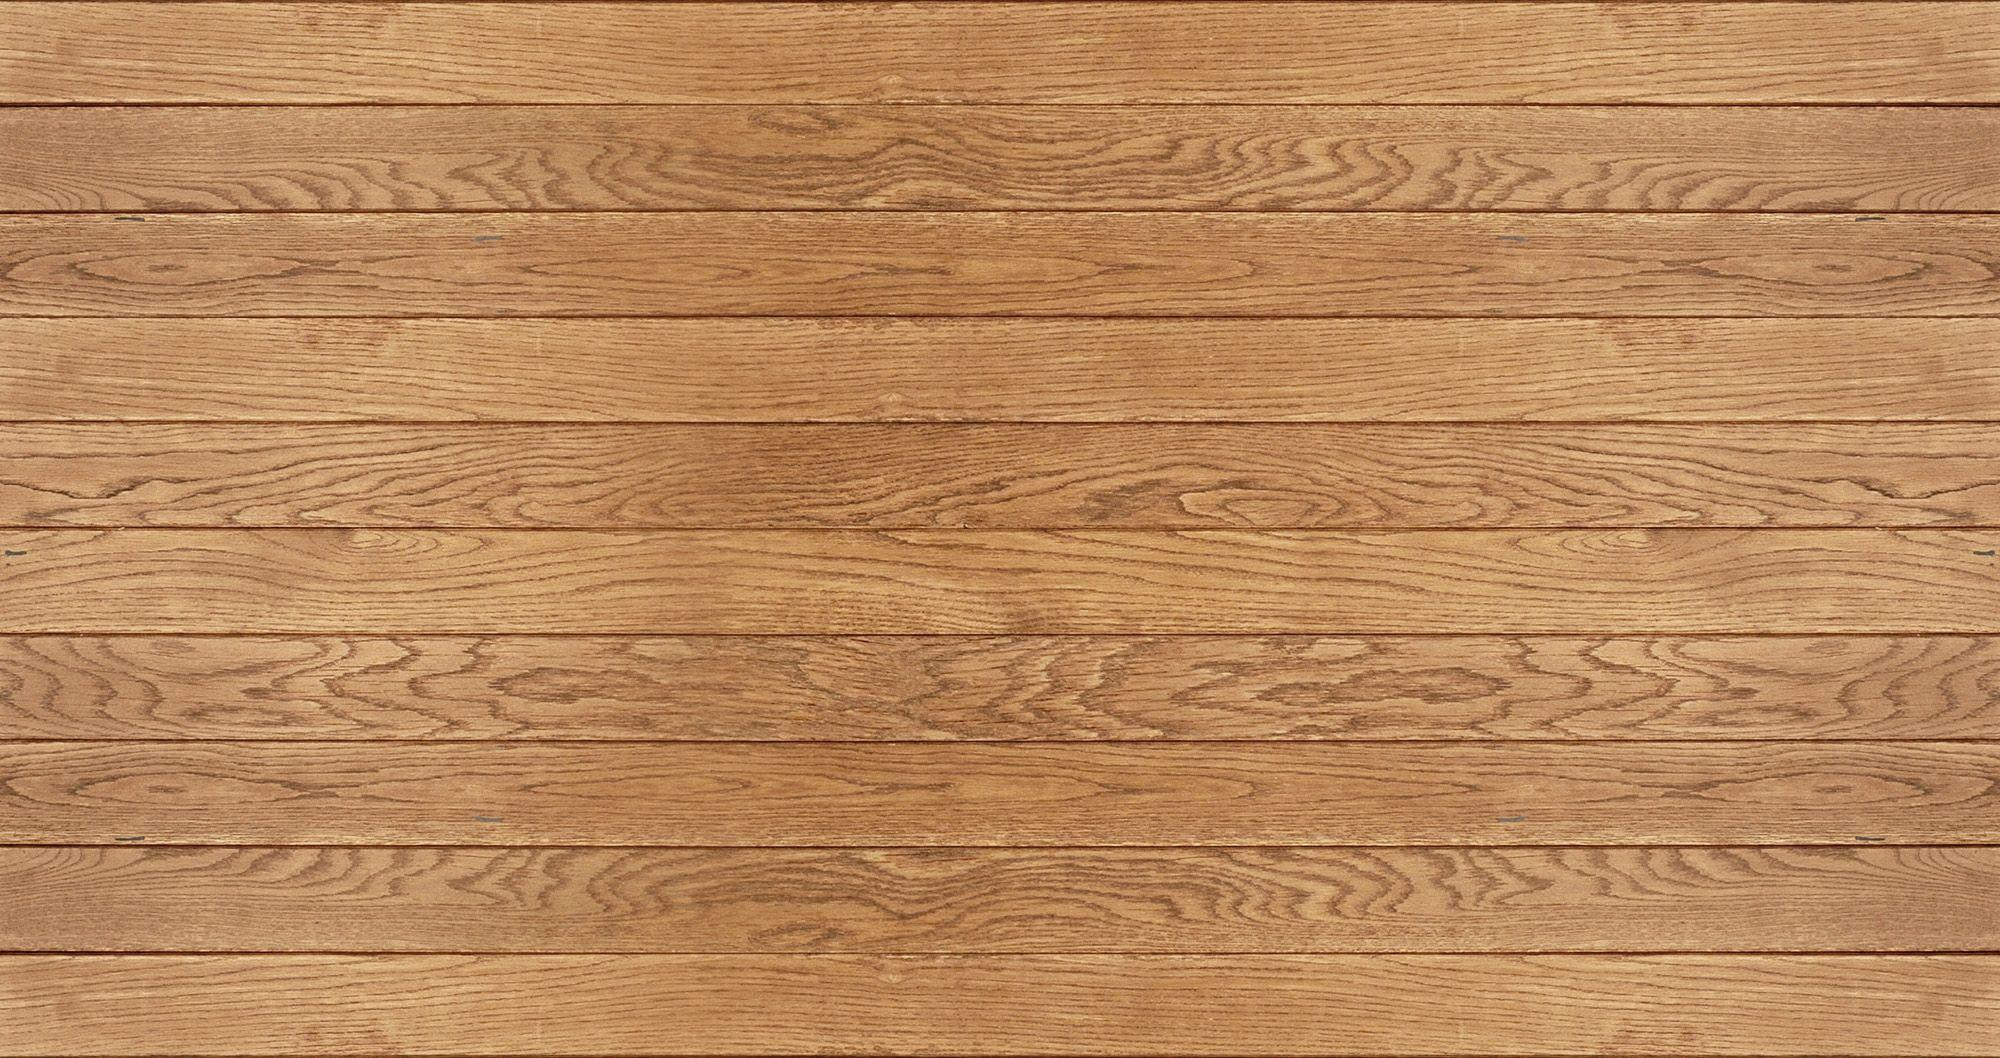 Light Wood Plank Textureallaboutbeauty21   Textures   Pinterest ...